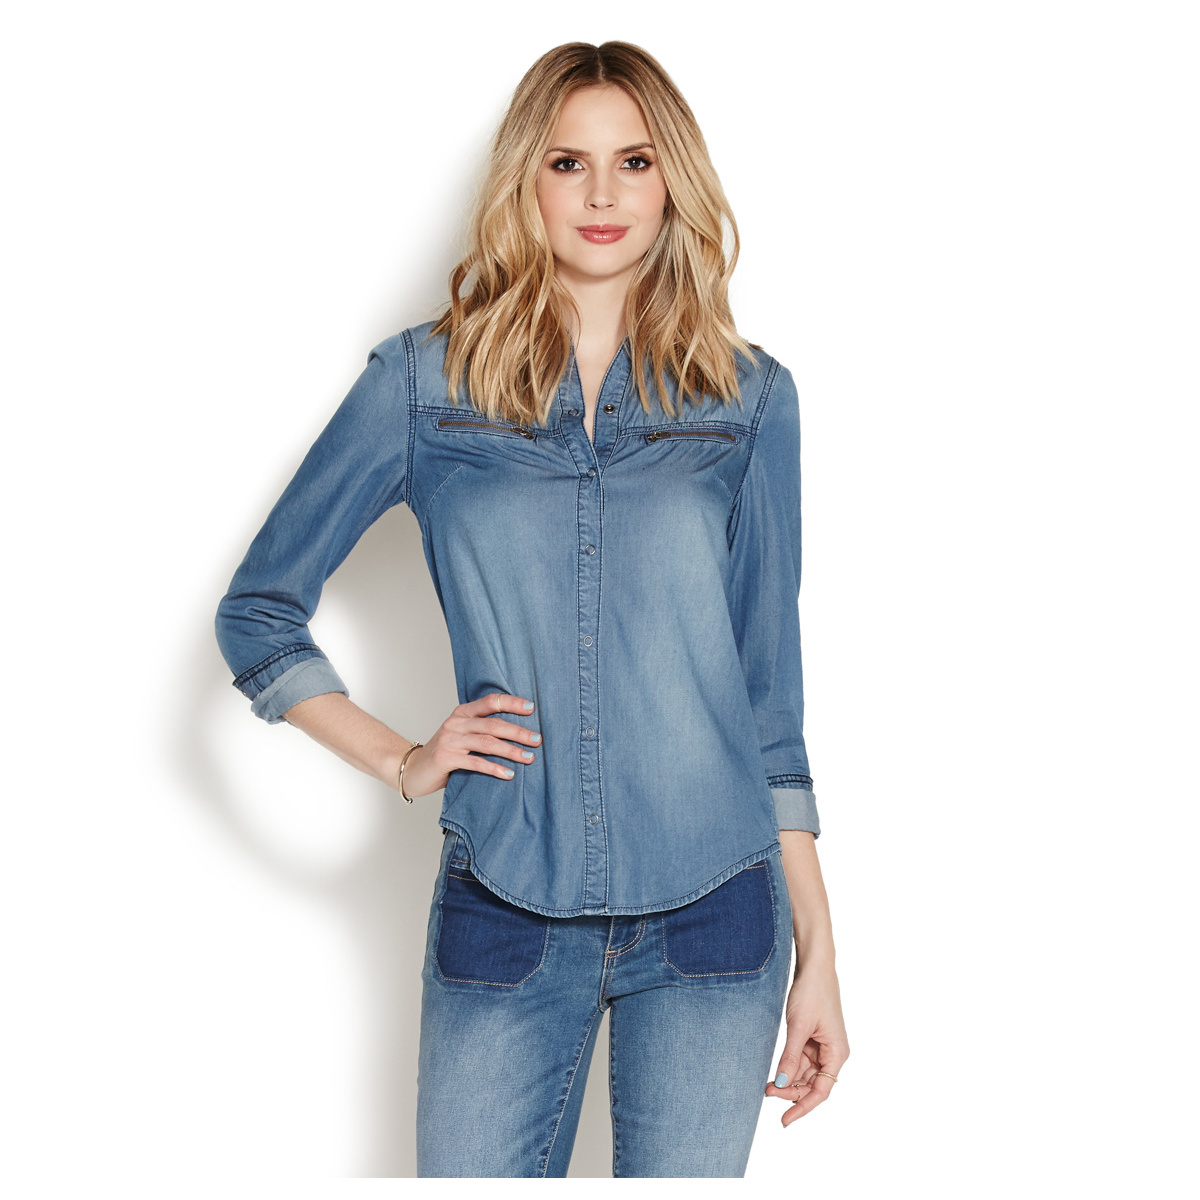 Casual Shirts Womens | Is Shirt